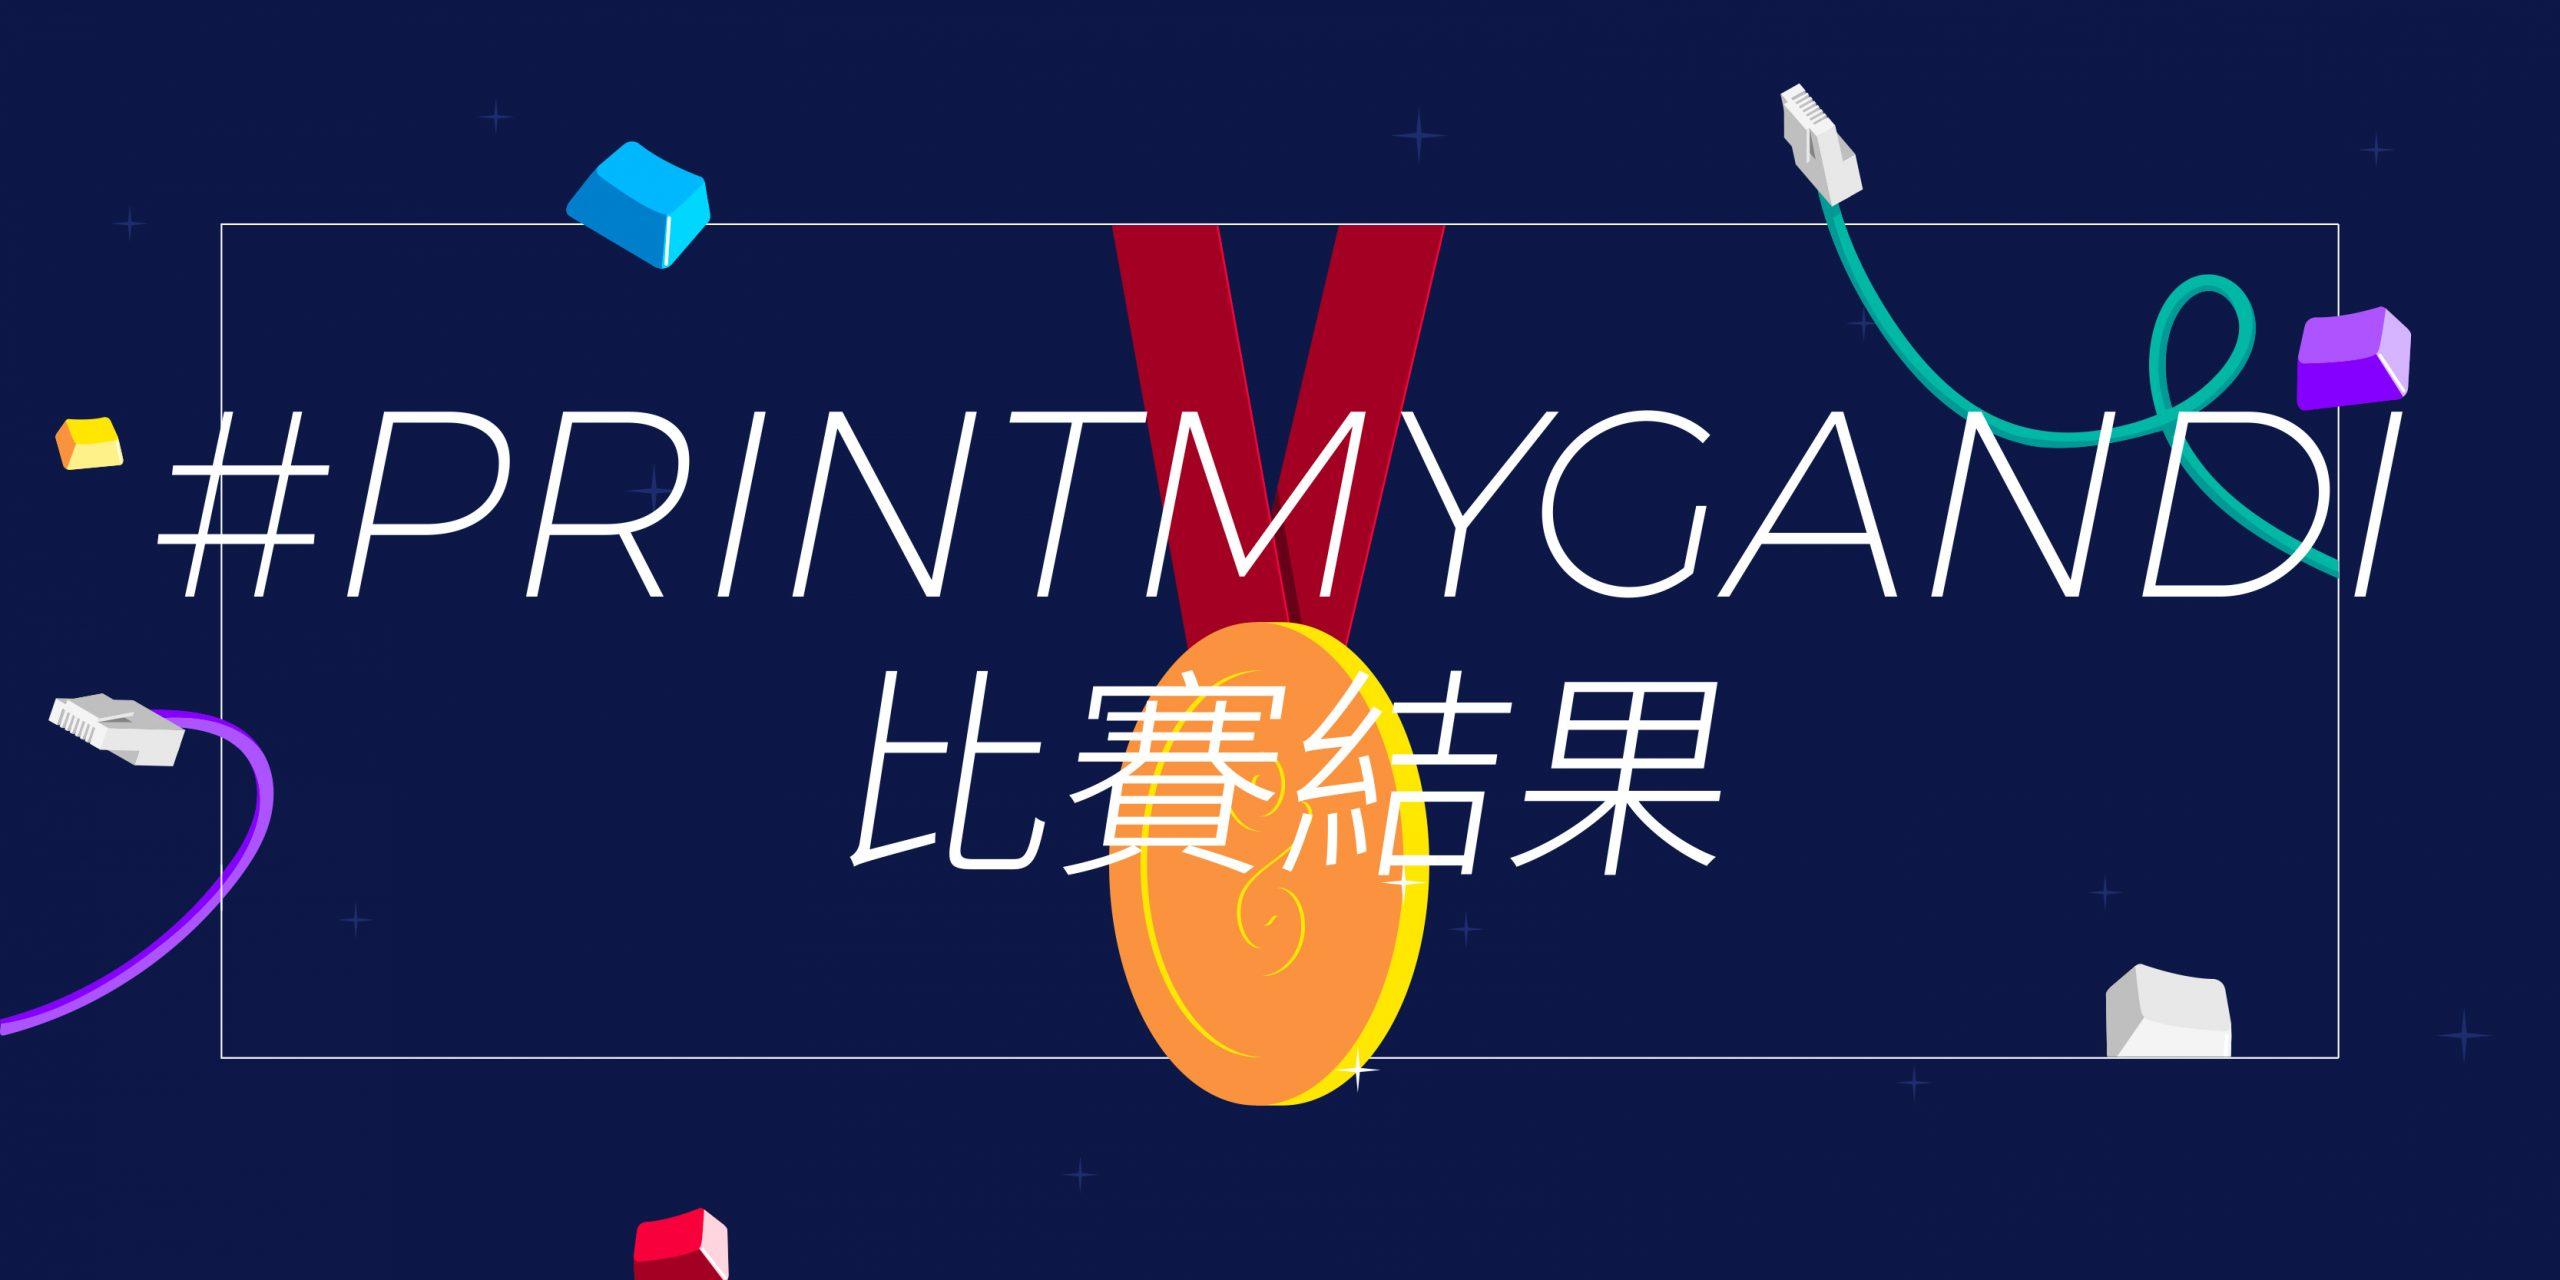 #PrintMyGandi T-shirt 設計競賽的大贏家們